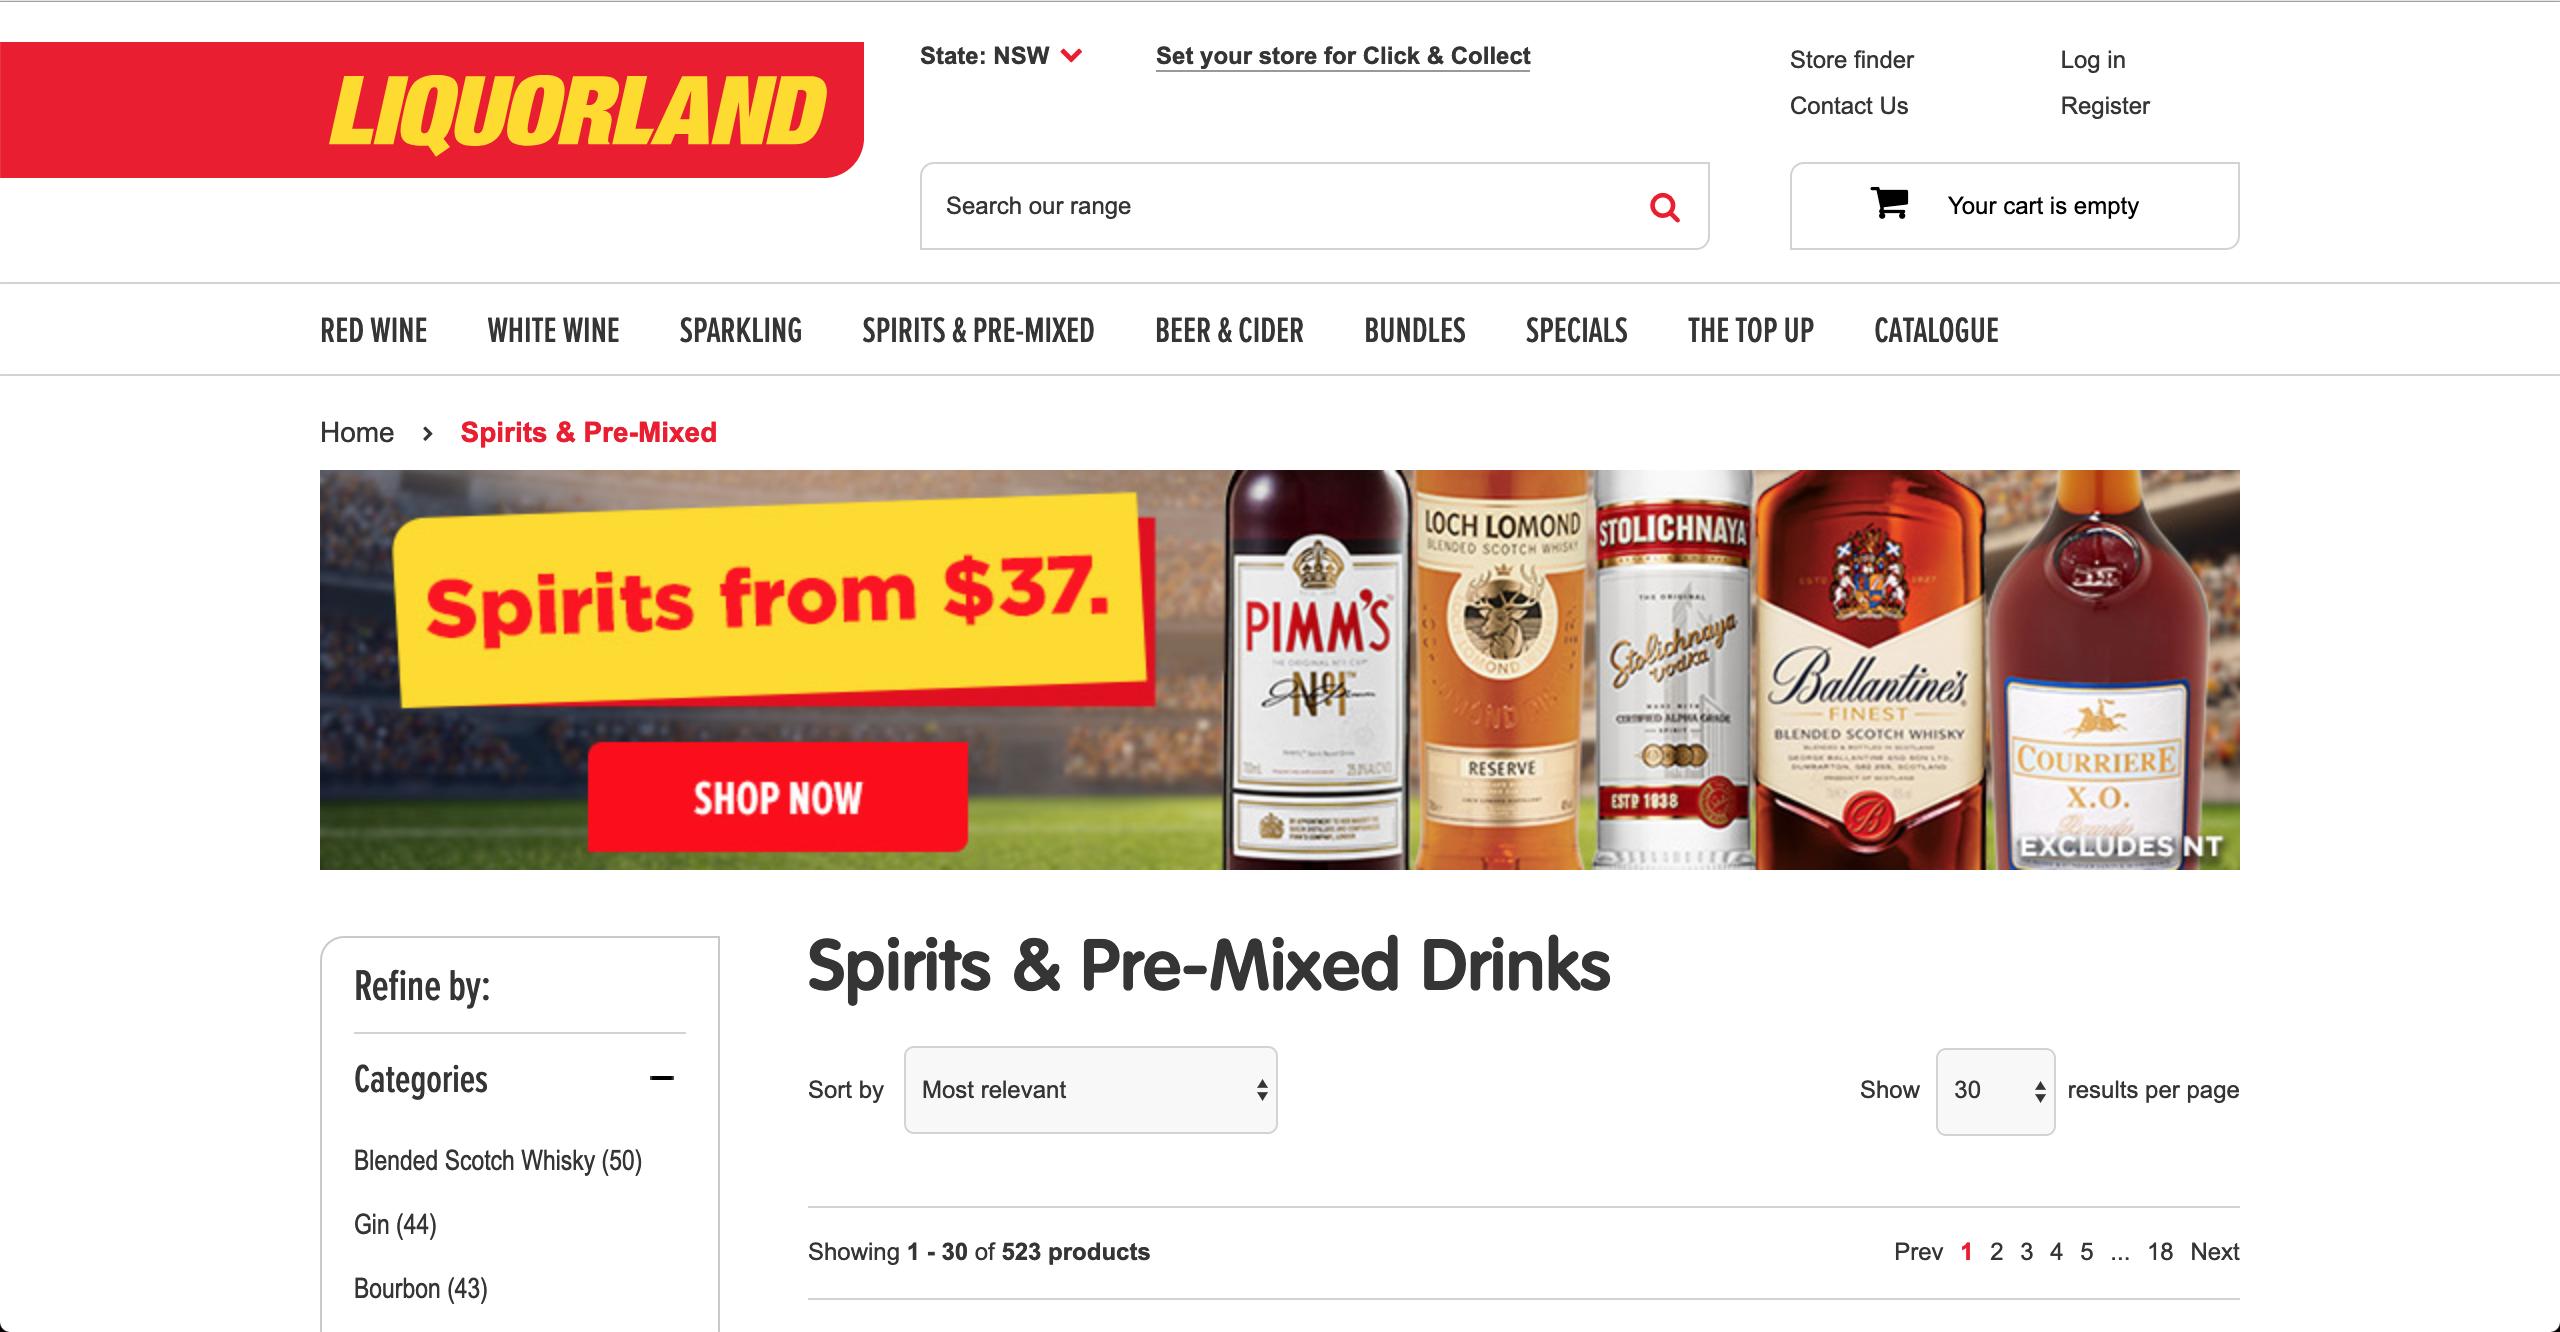 Liquorland Spirits & Premixed